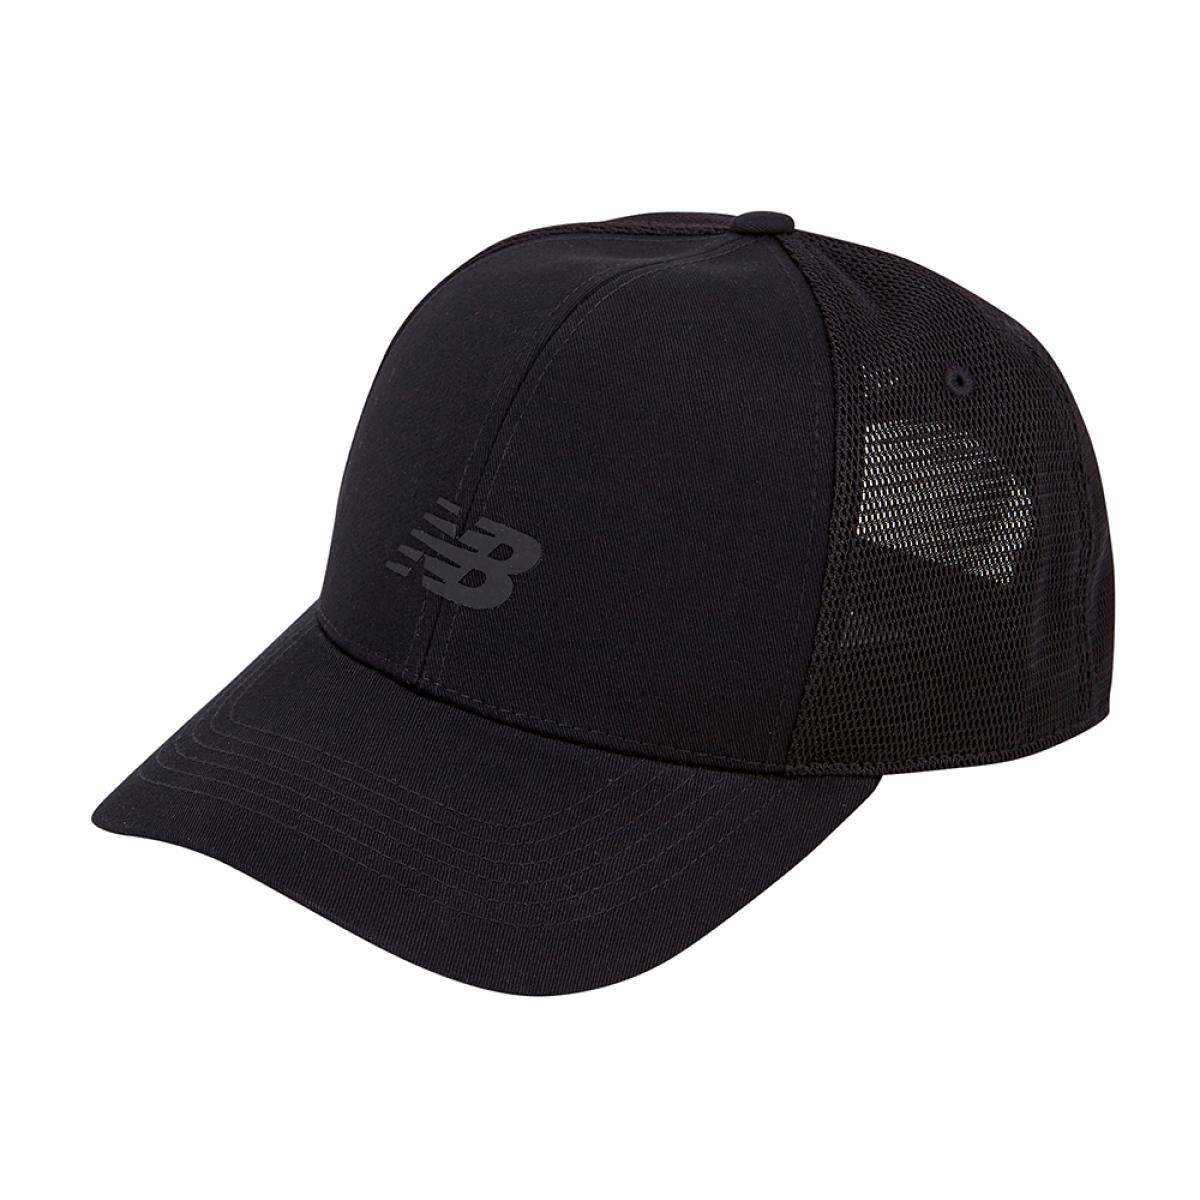 Mesh Ball Cap